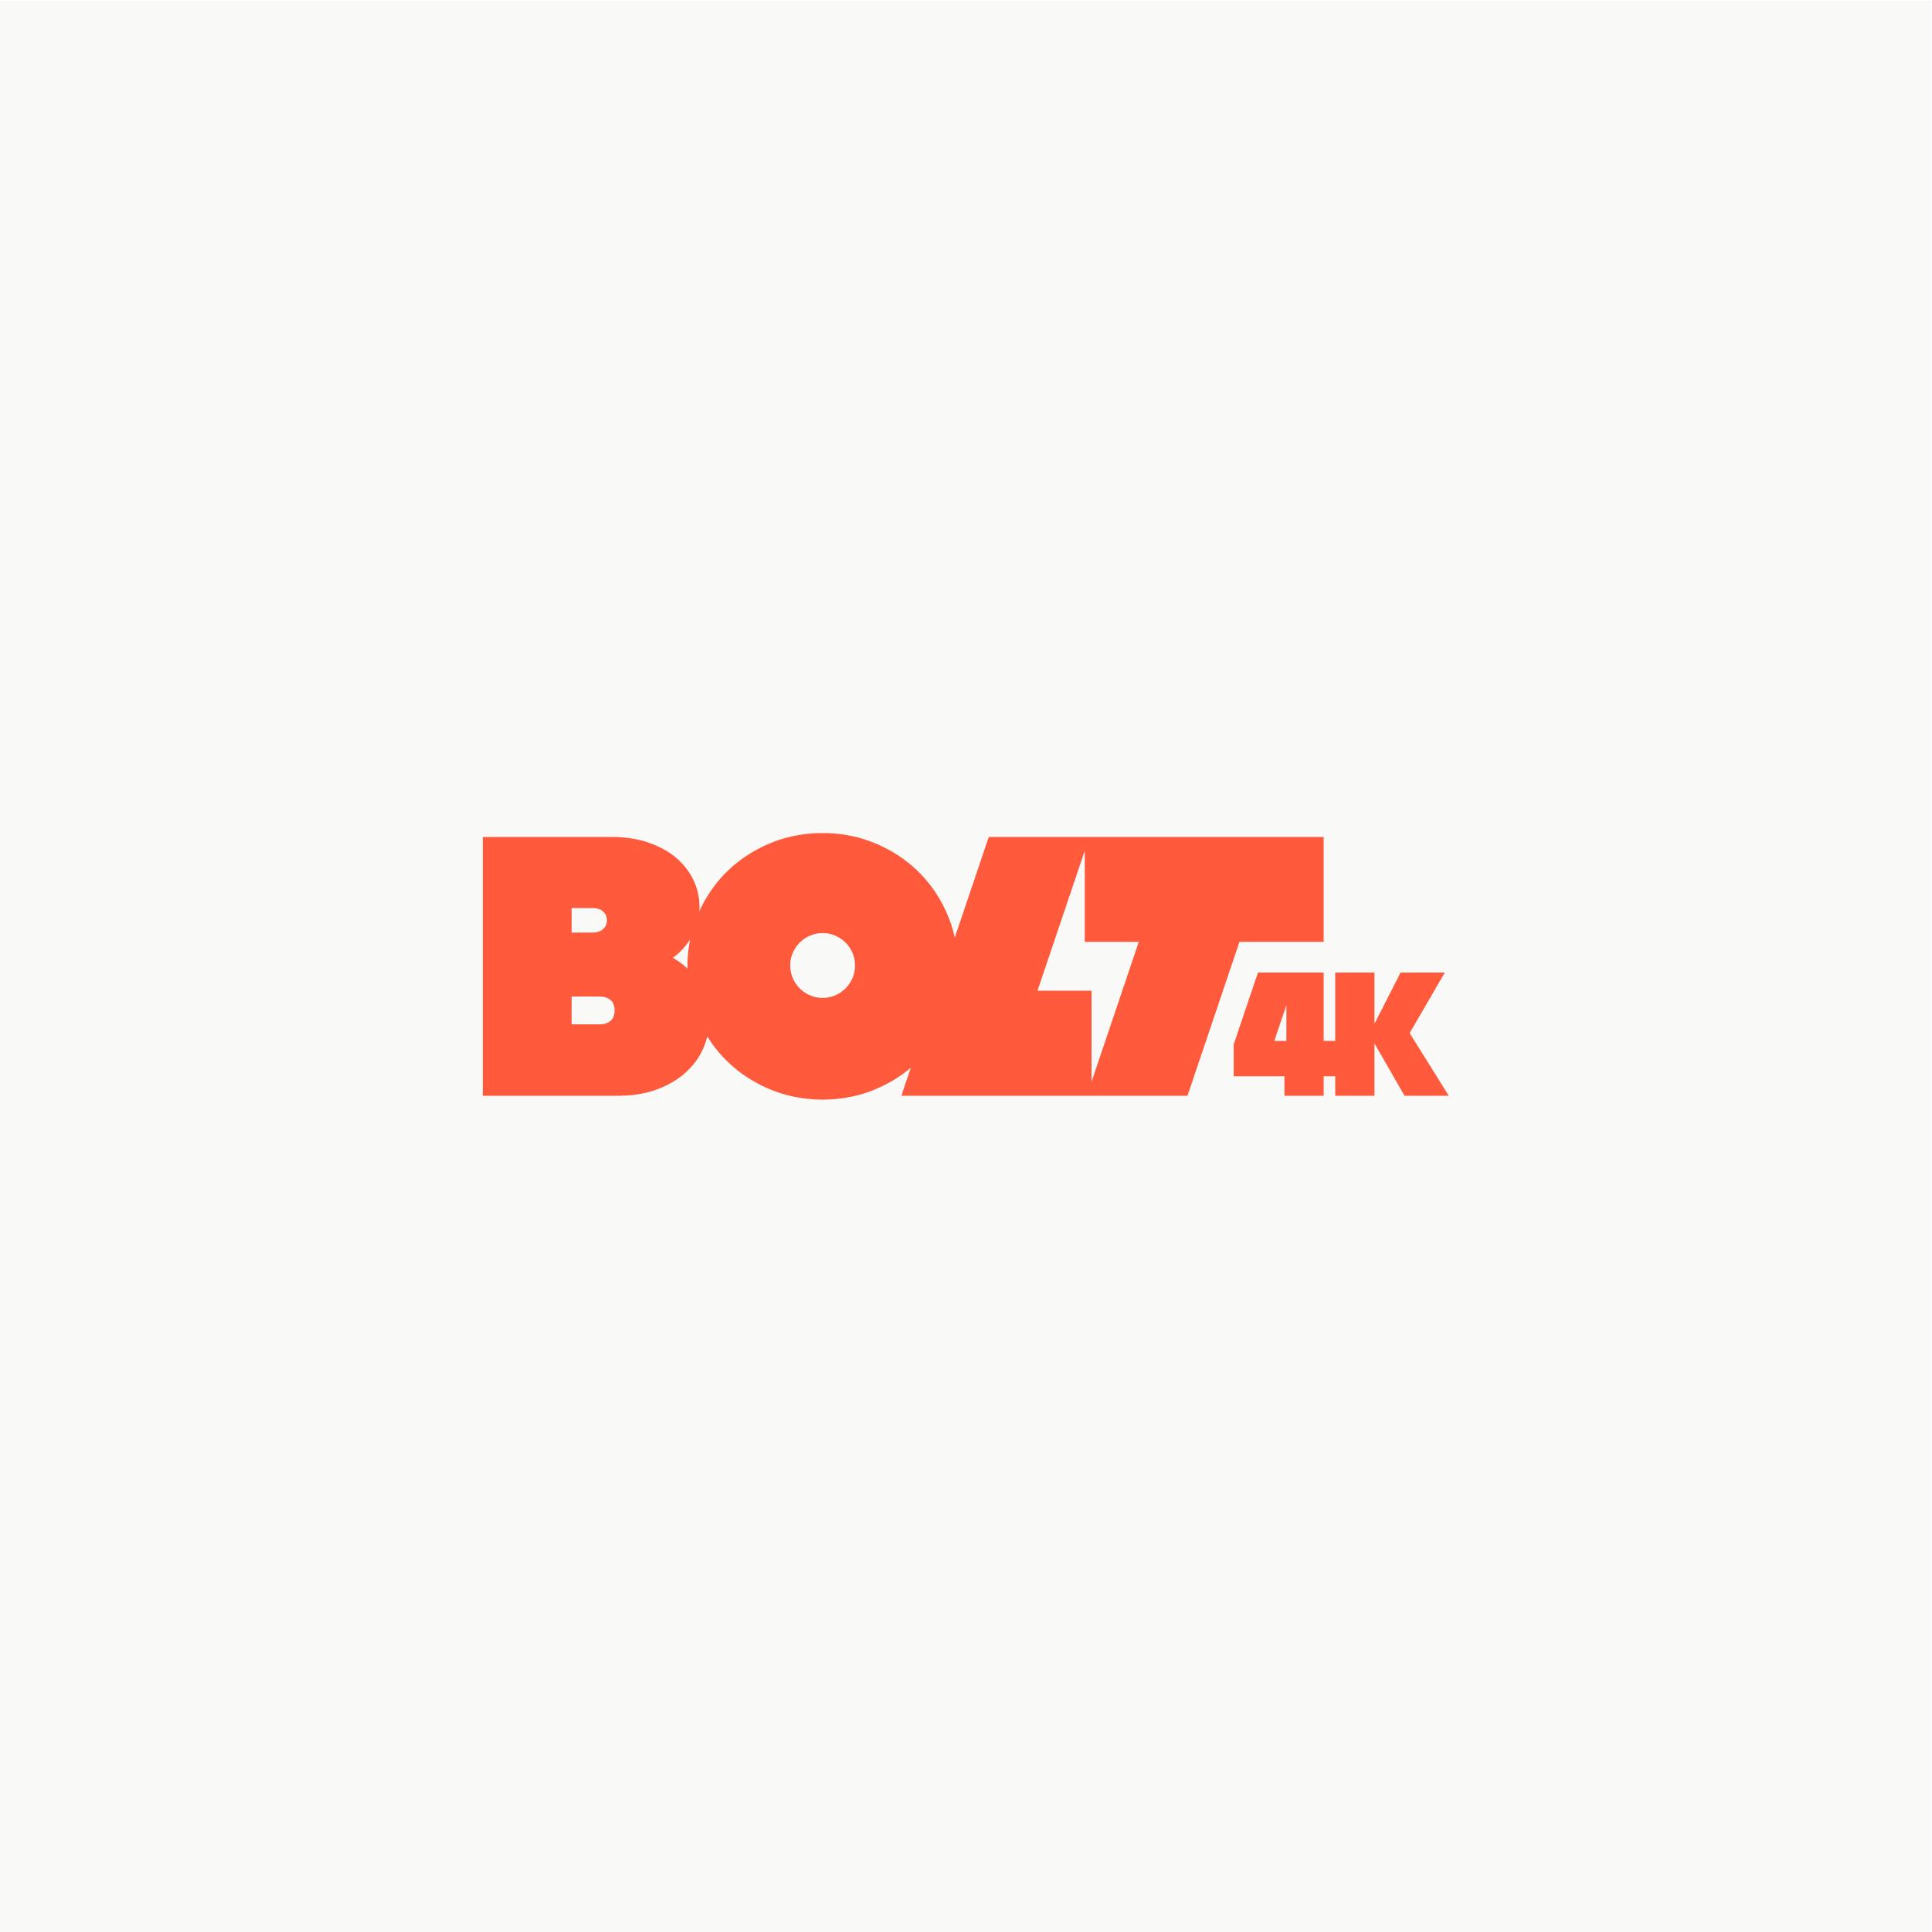 TBS_LogosMarks_Bolt4K